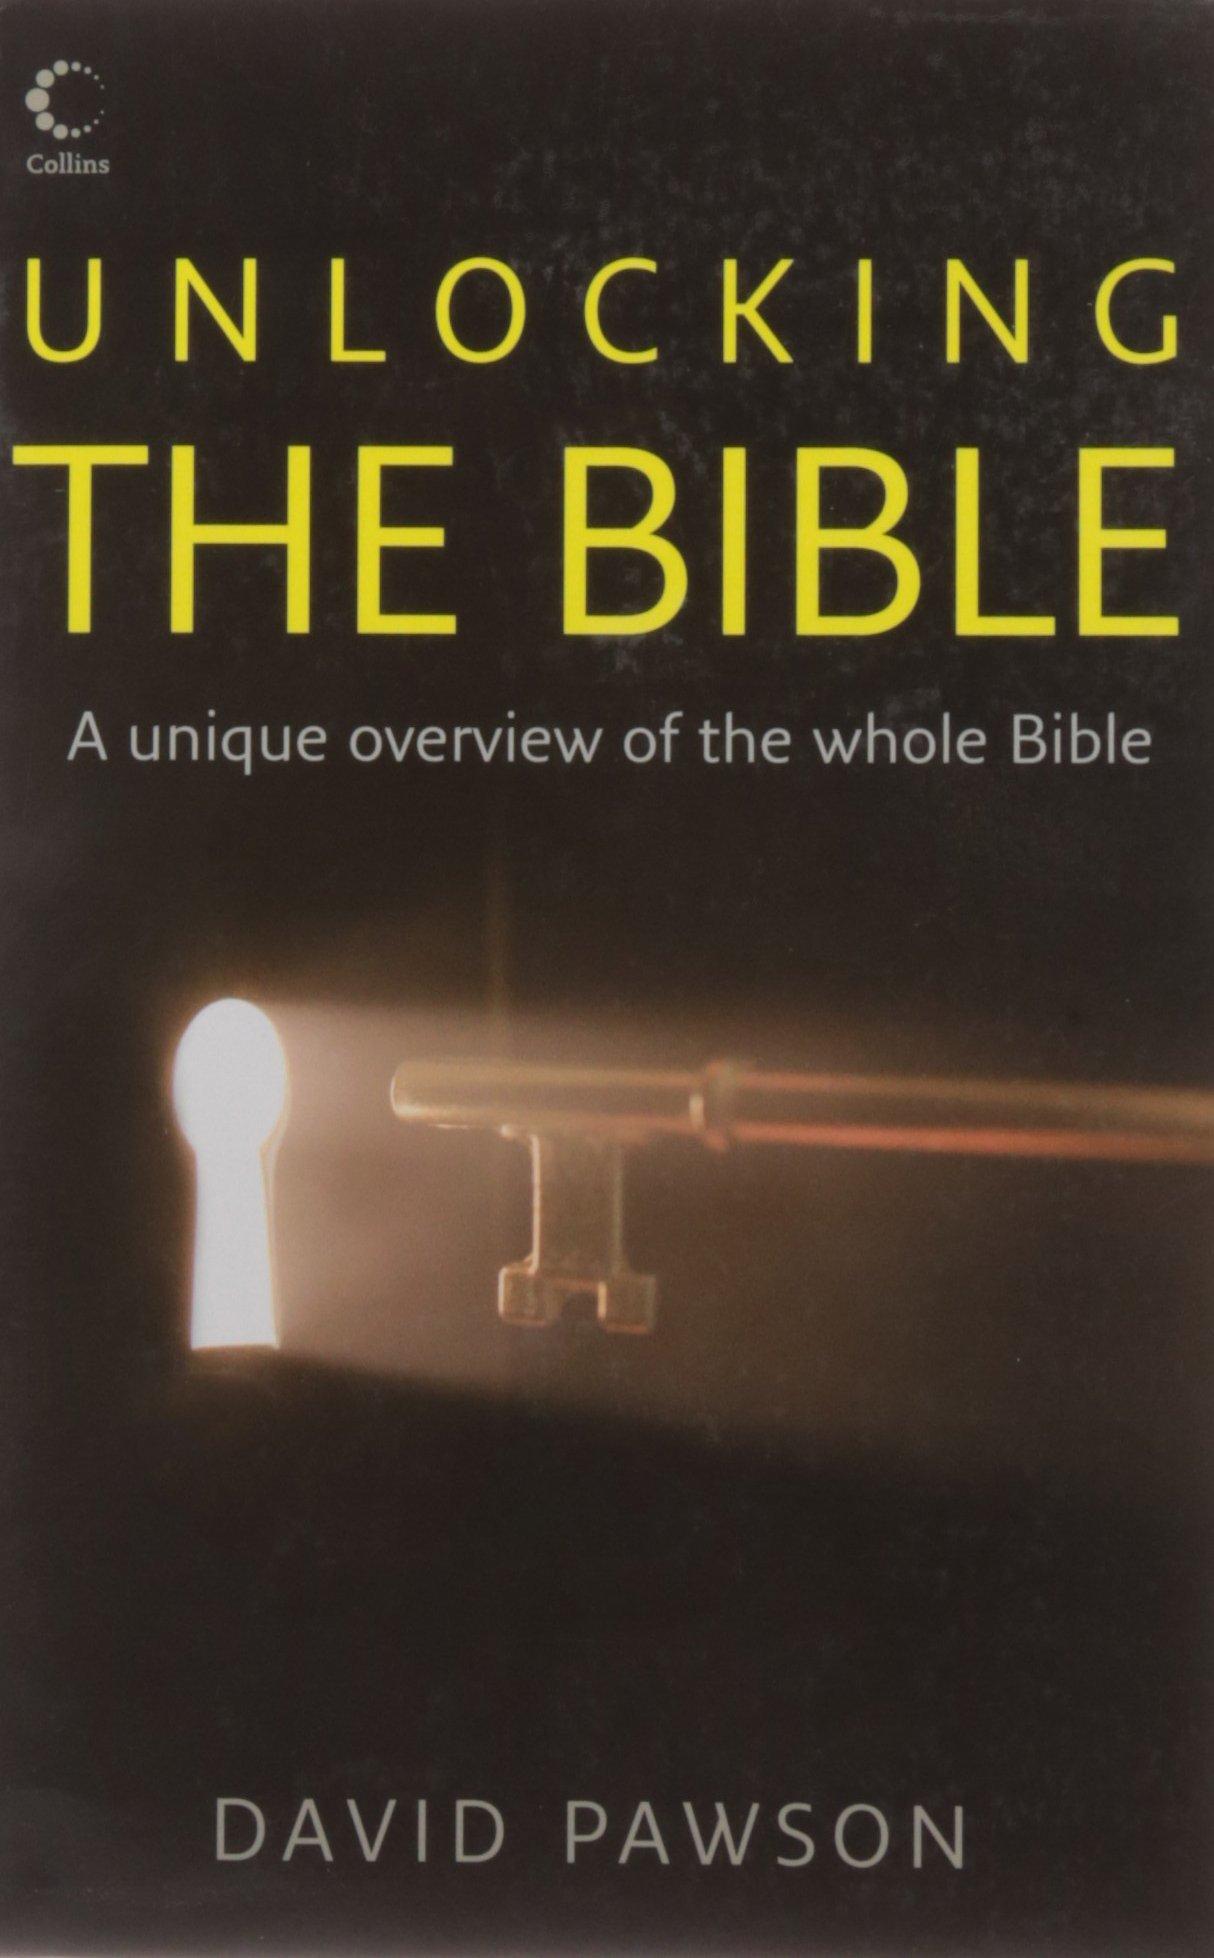 unlocking the bible david pawson 9780007166664 amazon com books